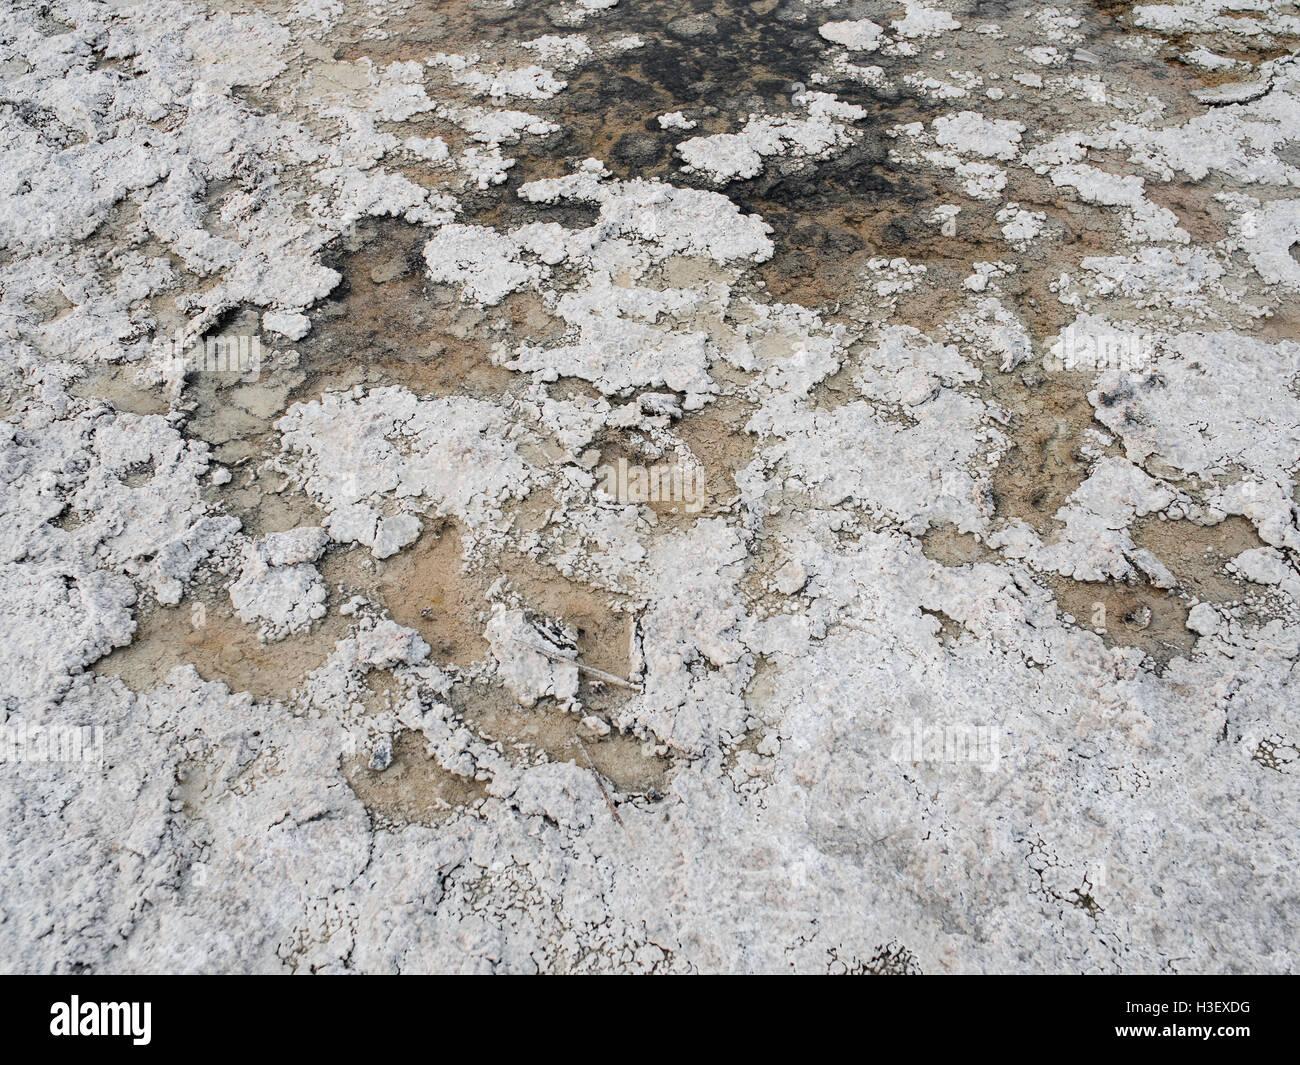 Badwater Basin - Parque Nacional Valle de la muerte Imagen De Stock